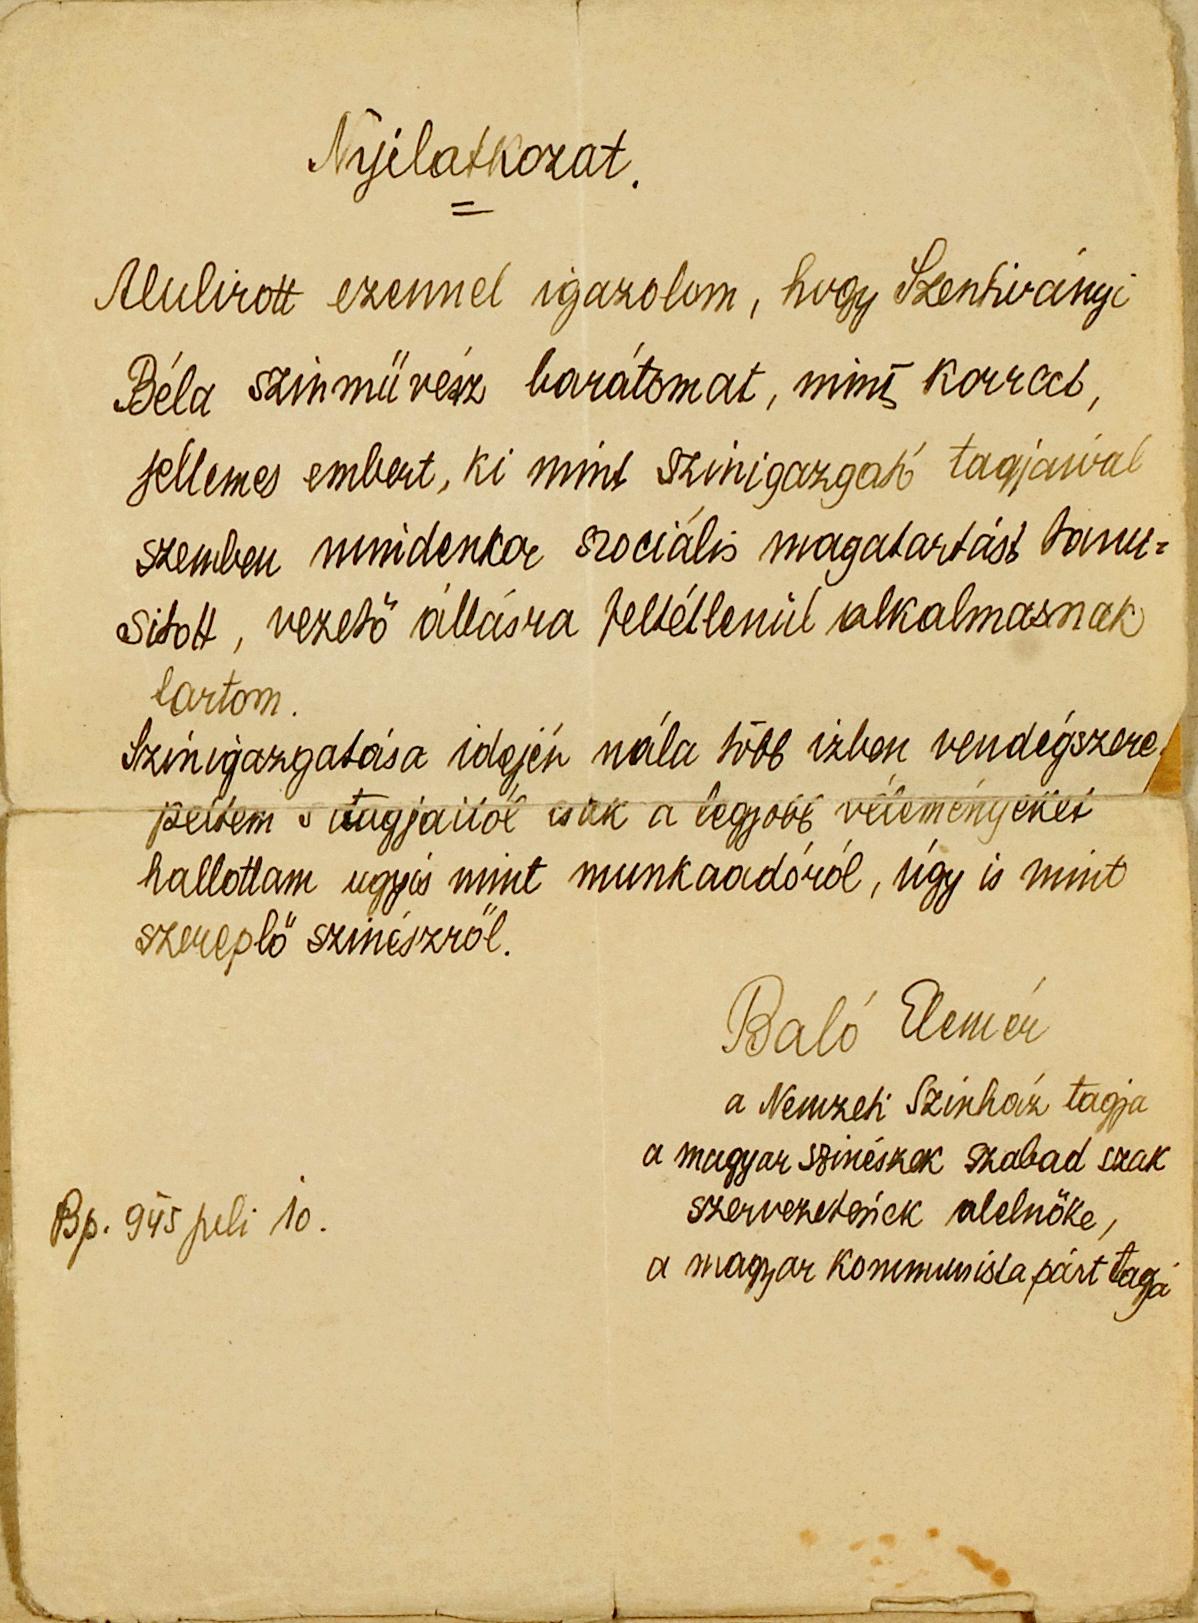 1945_balo_elemer.jpg